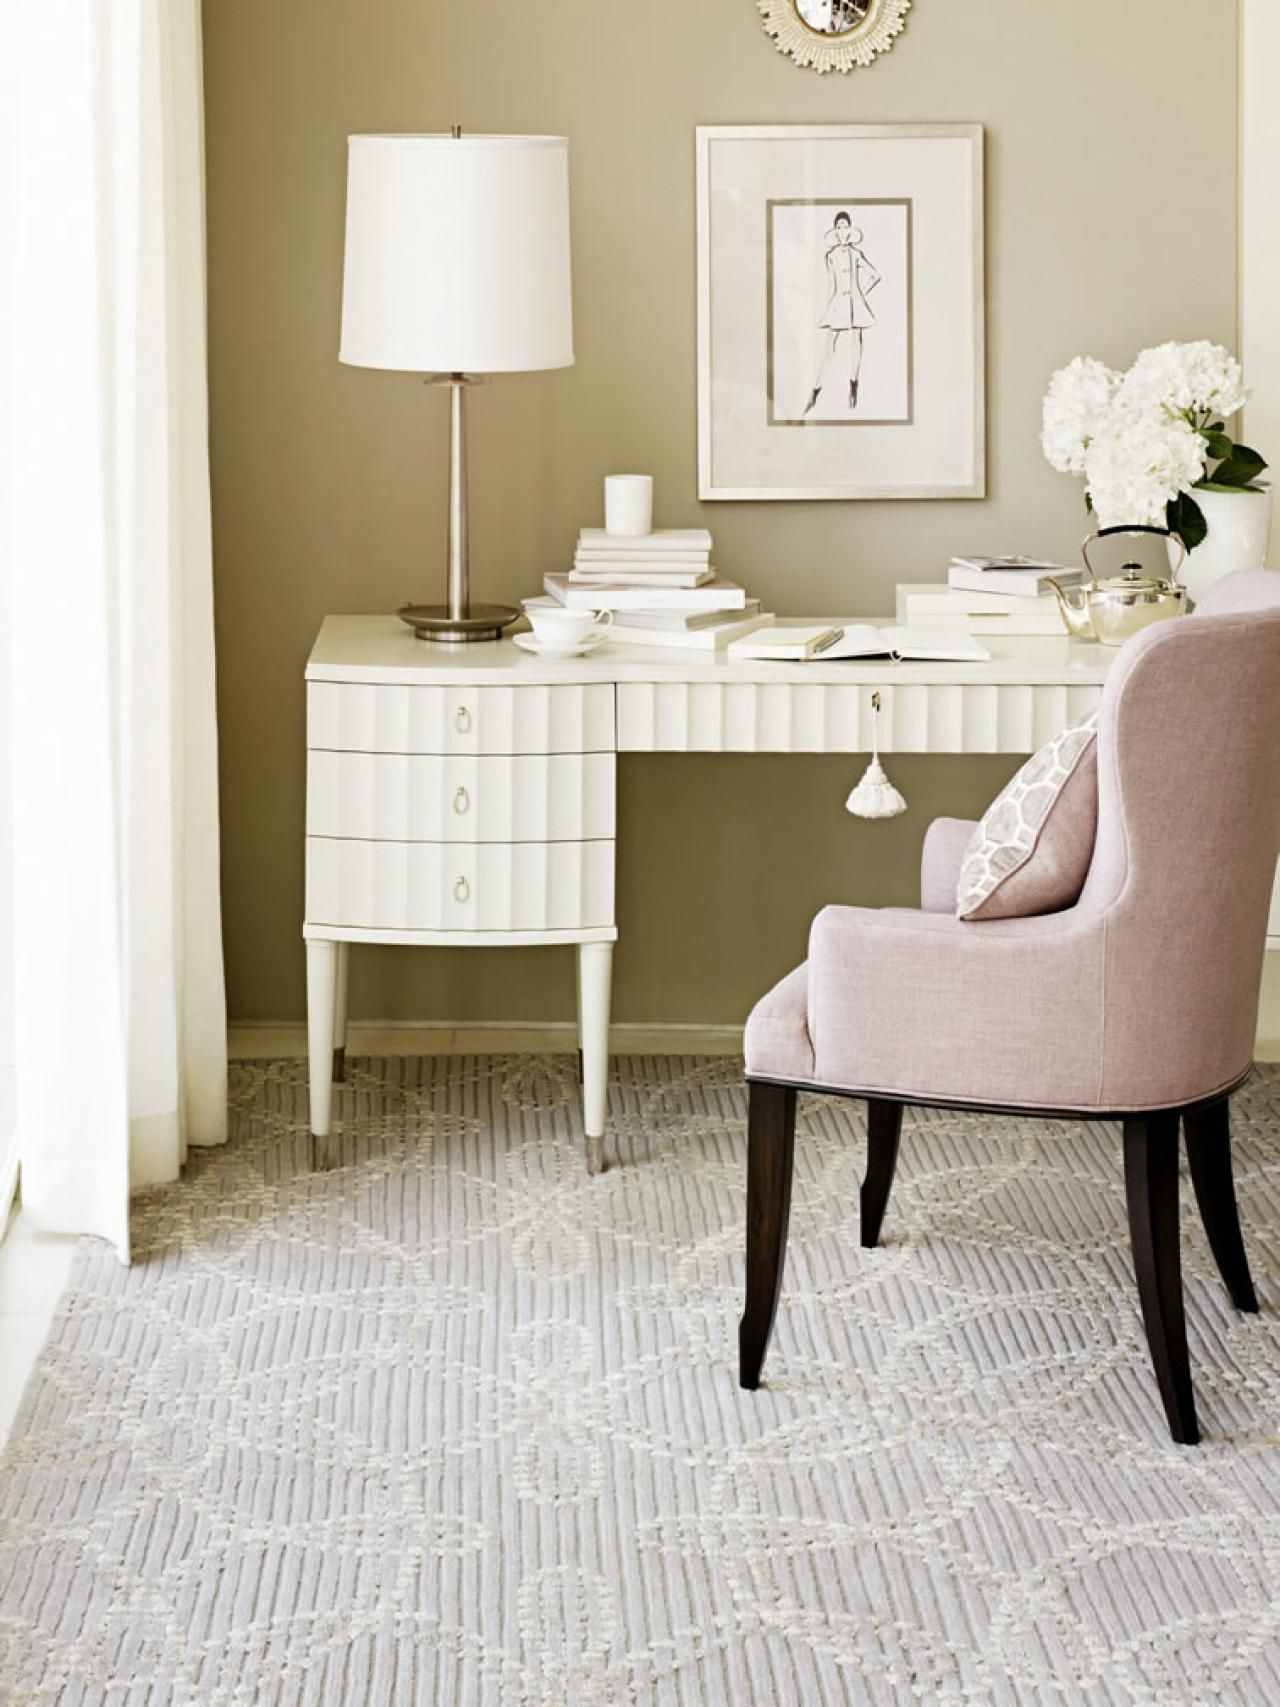 Image result for feminine desk chair For the Home